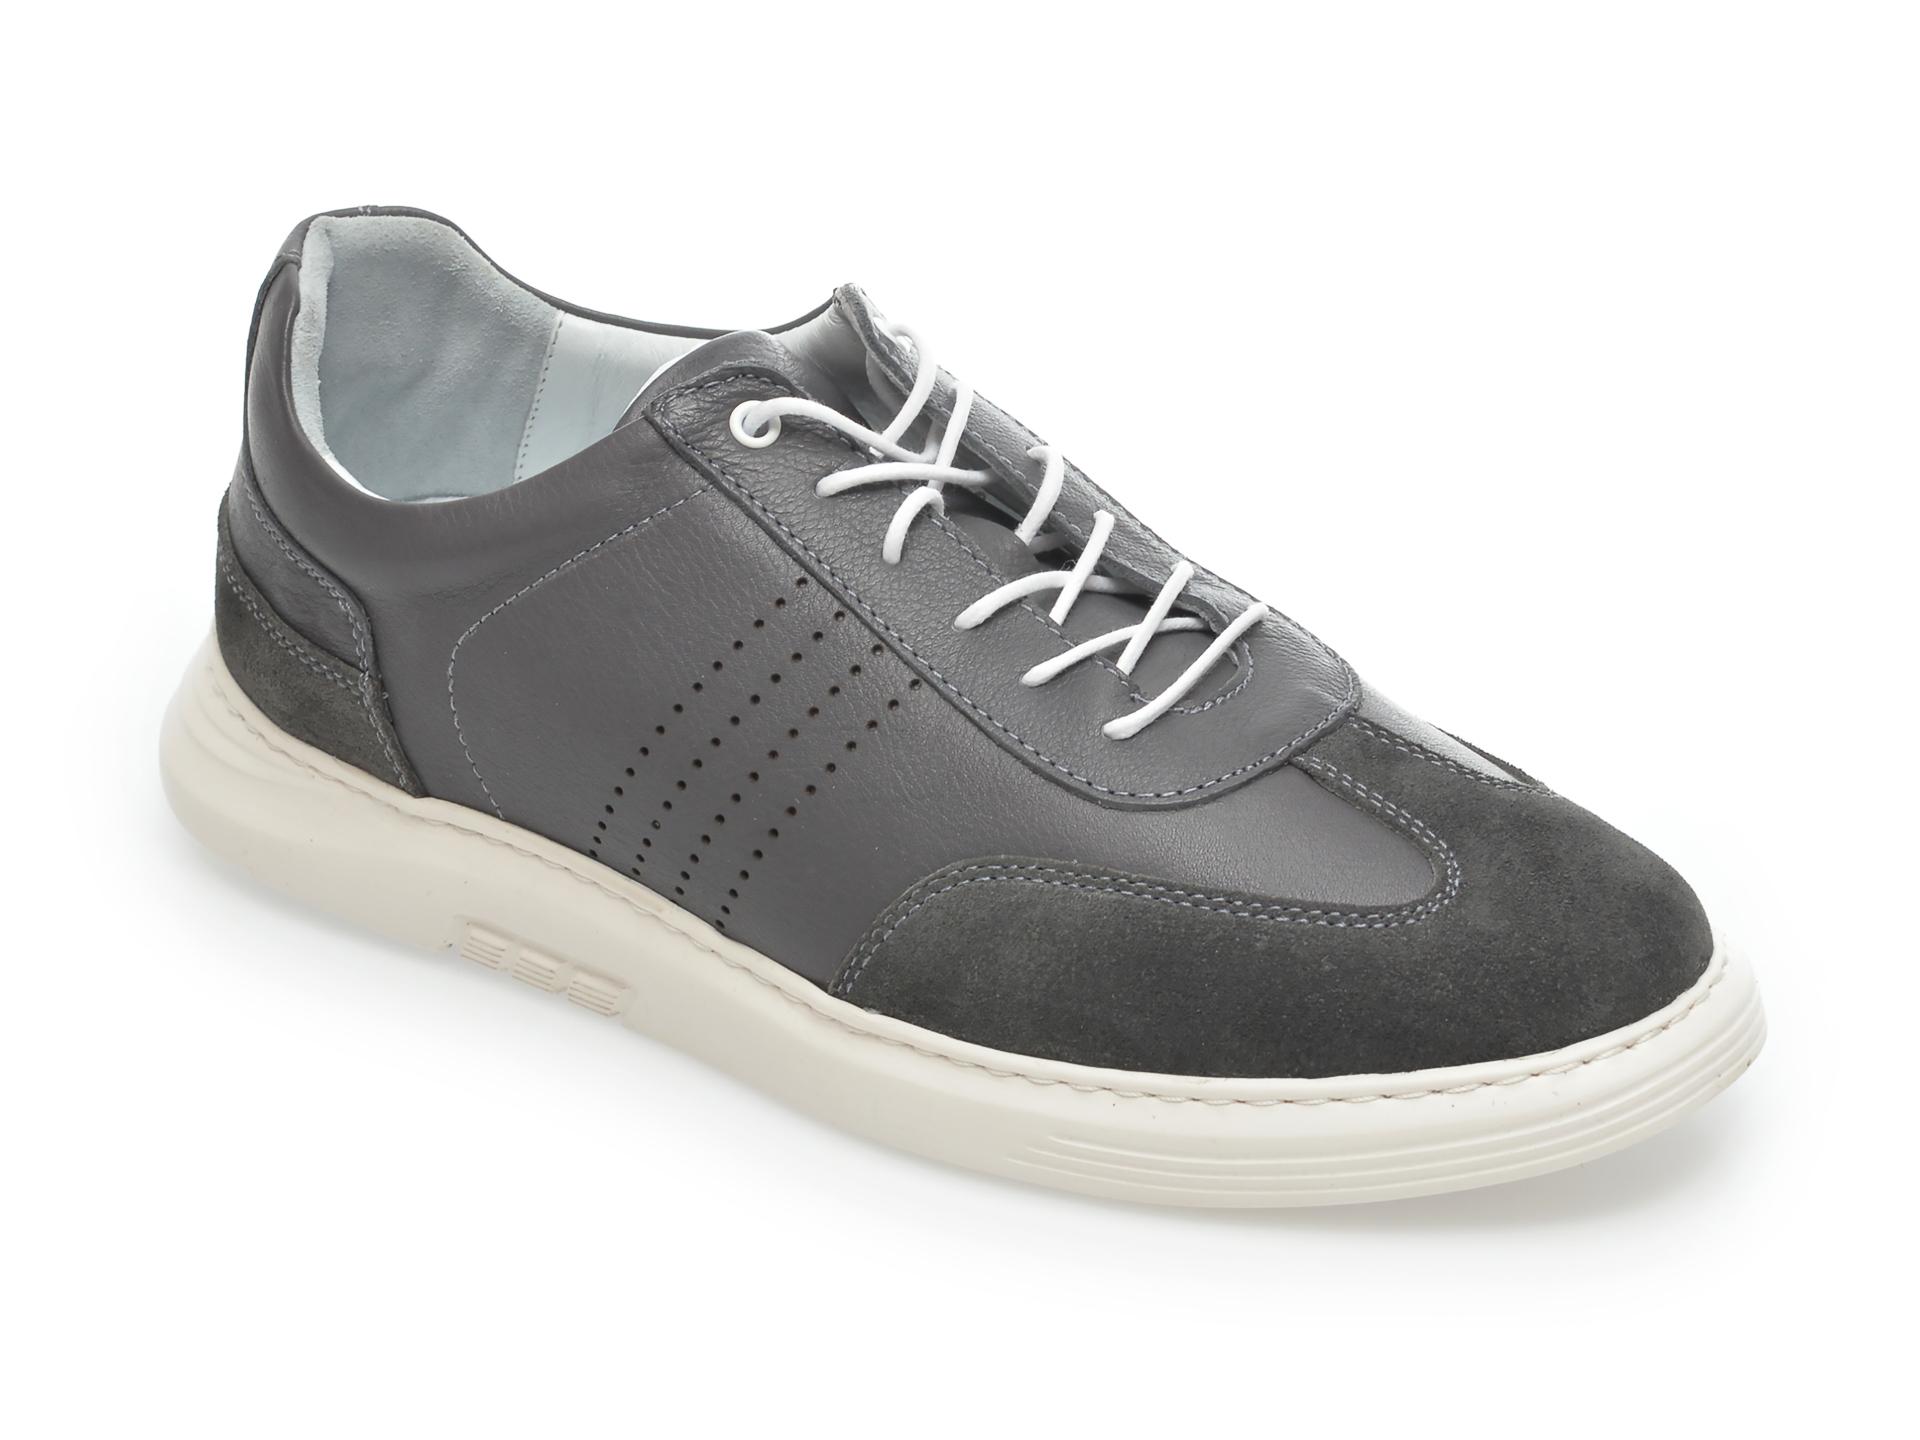 Pantofi OTTER gri, 2024, din piele naturala imagine